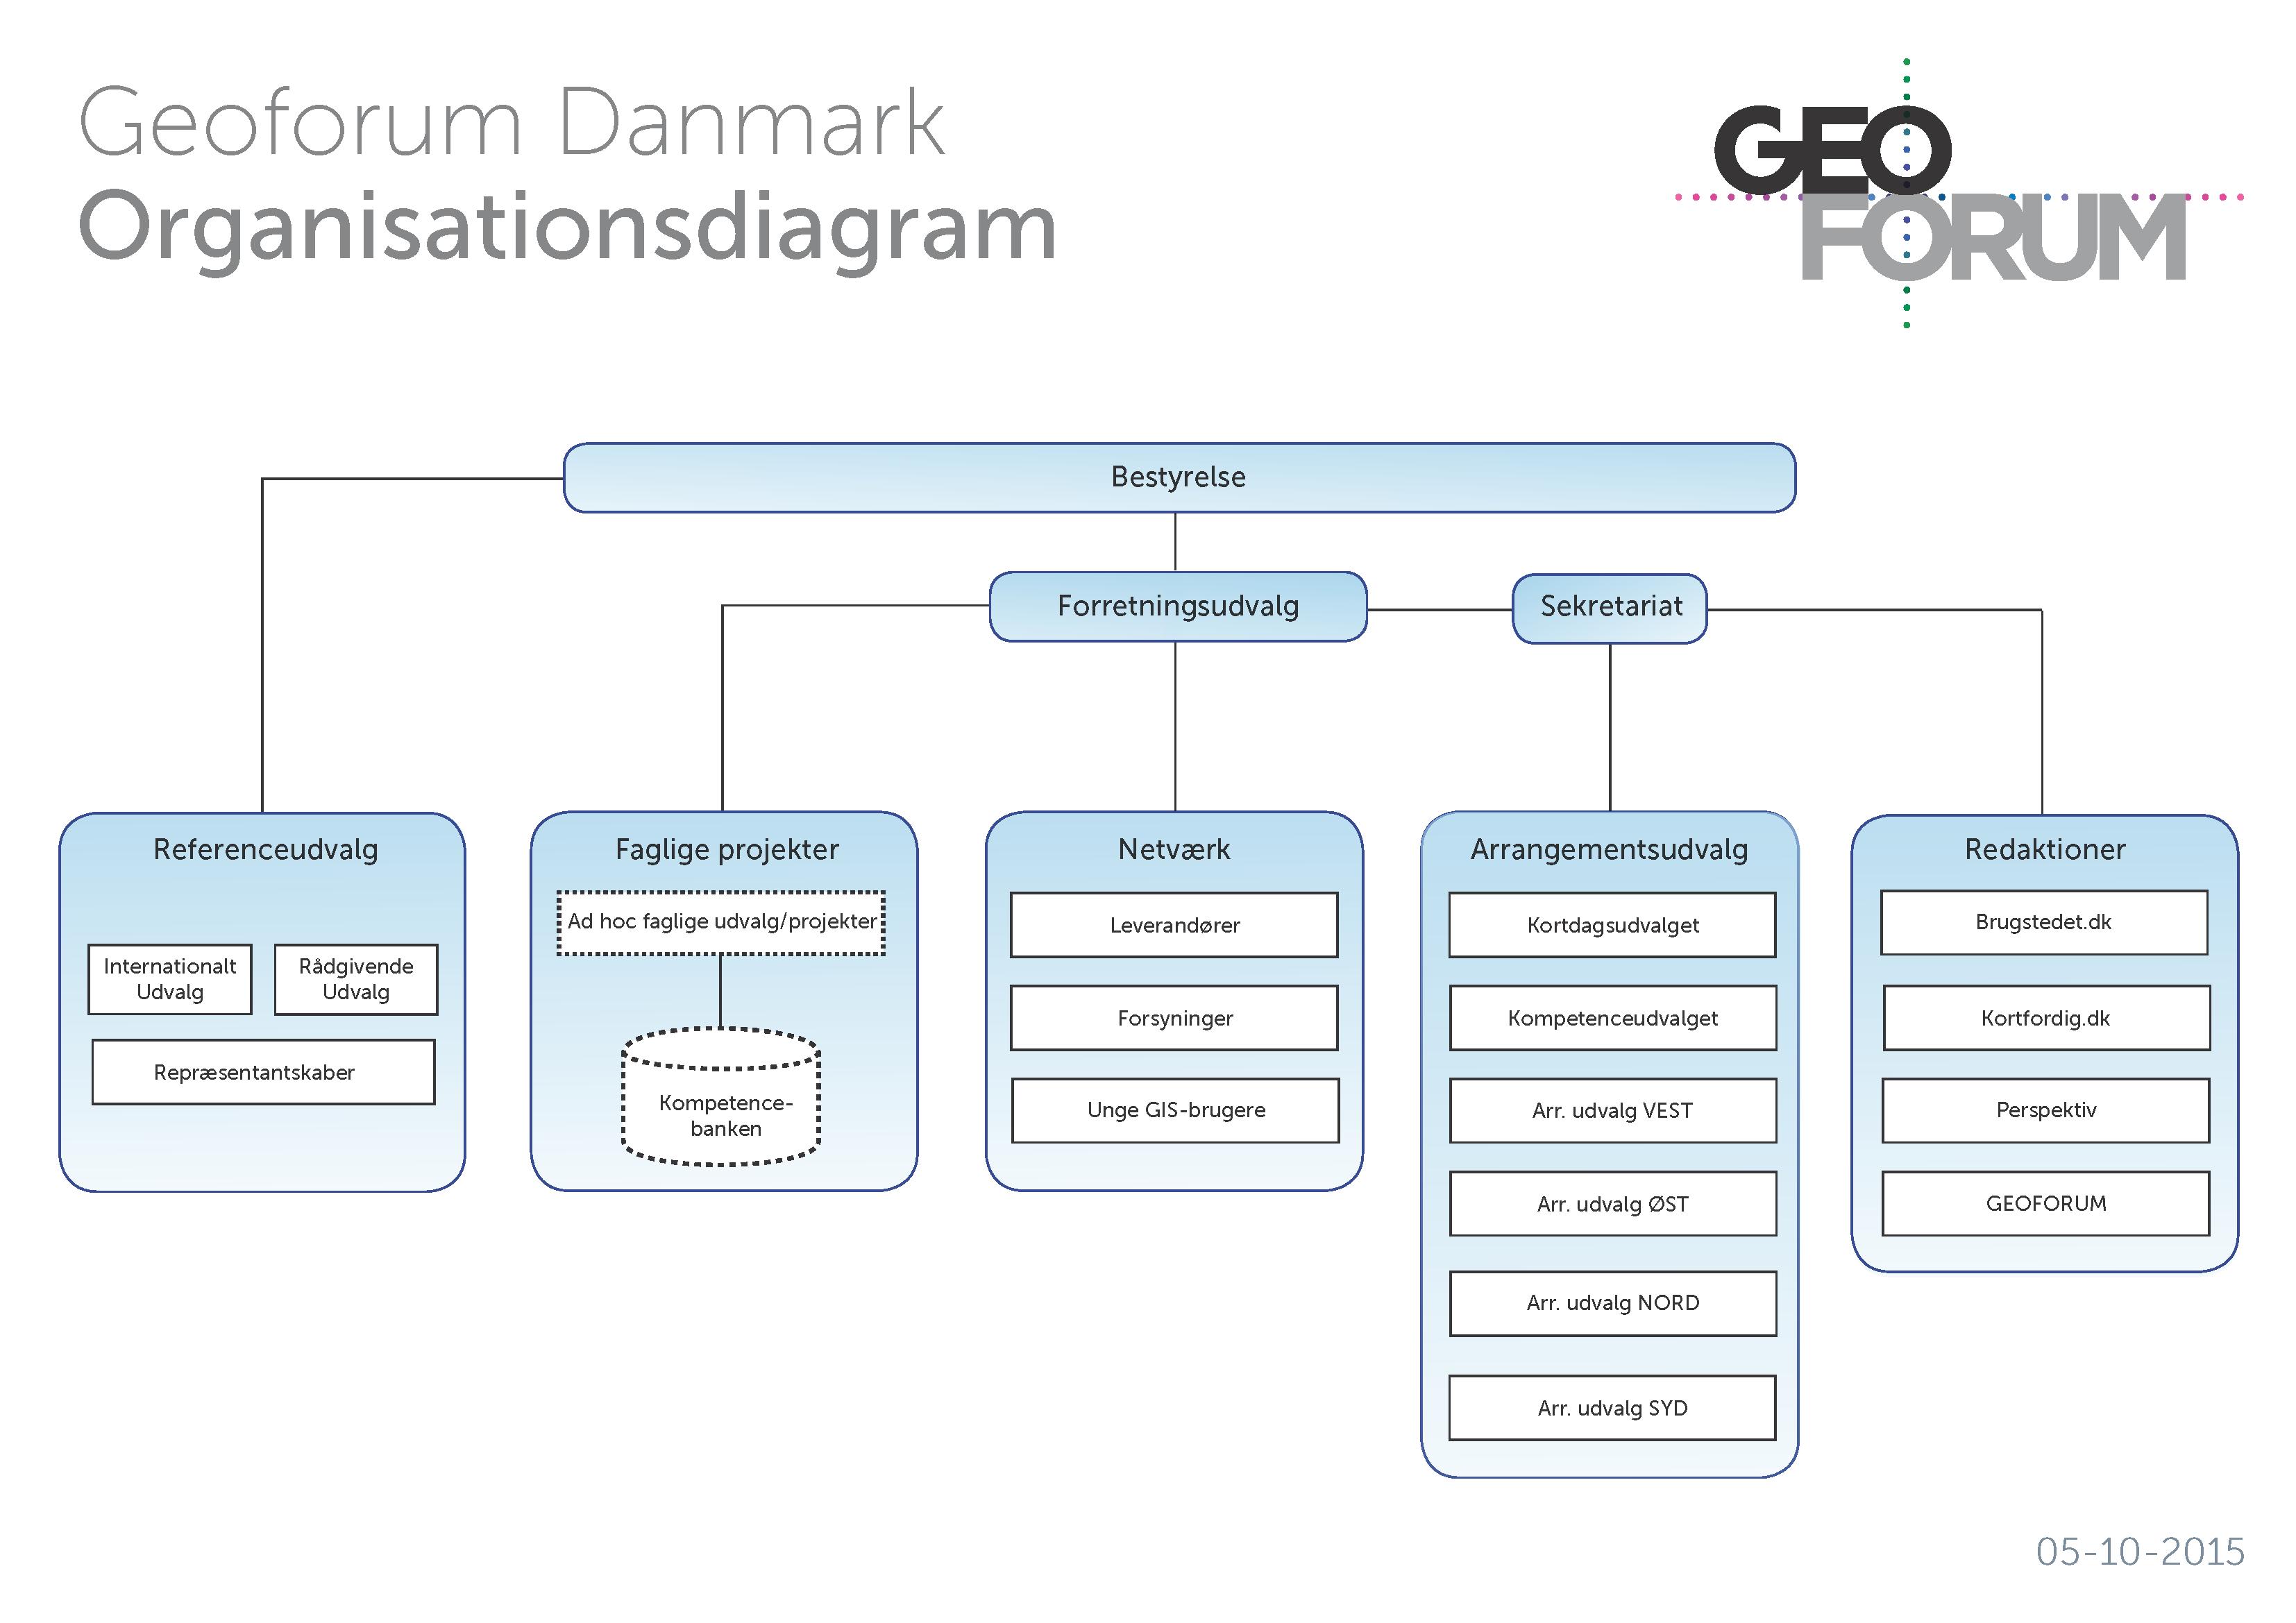 Organisationsdiagram 2015